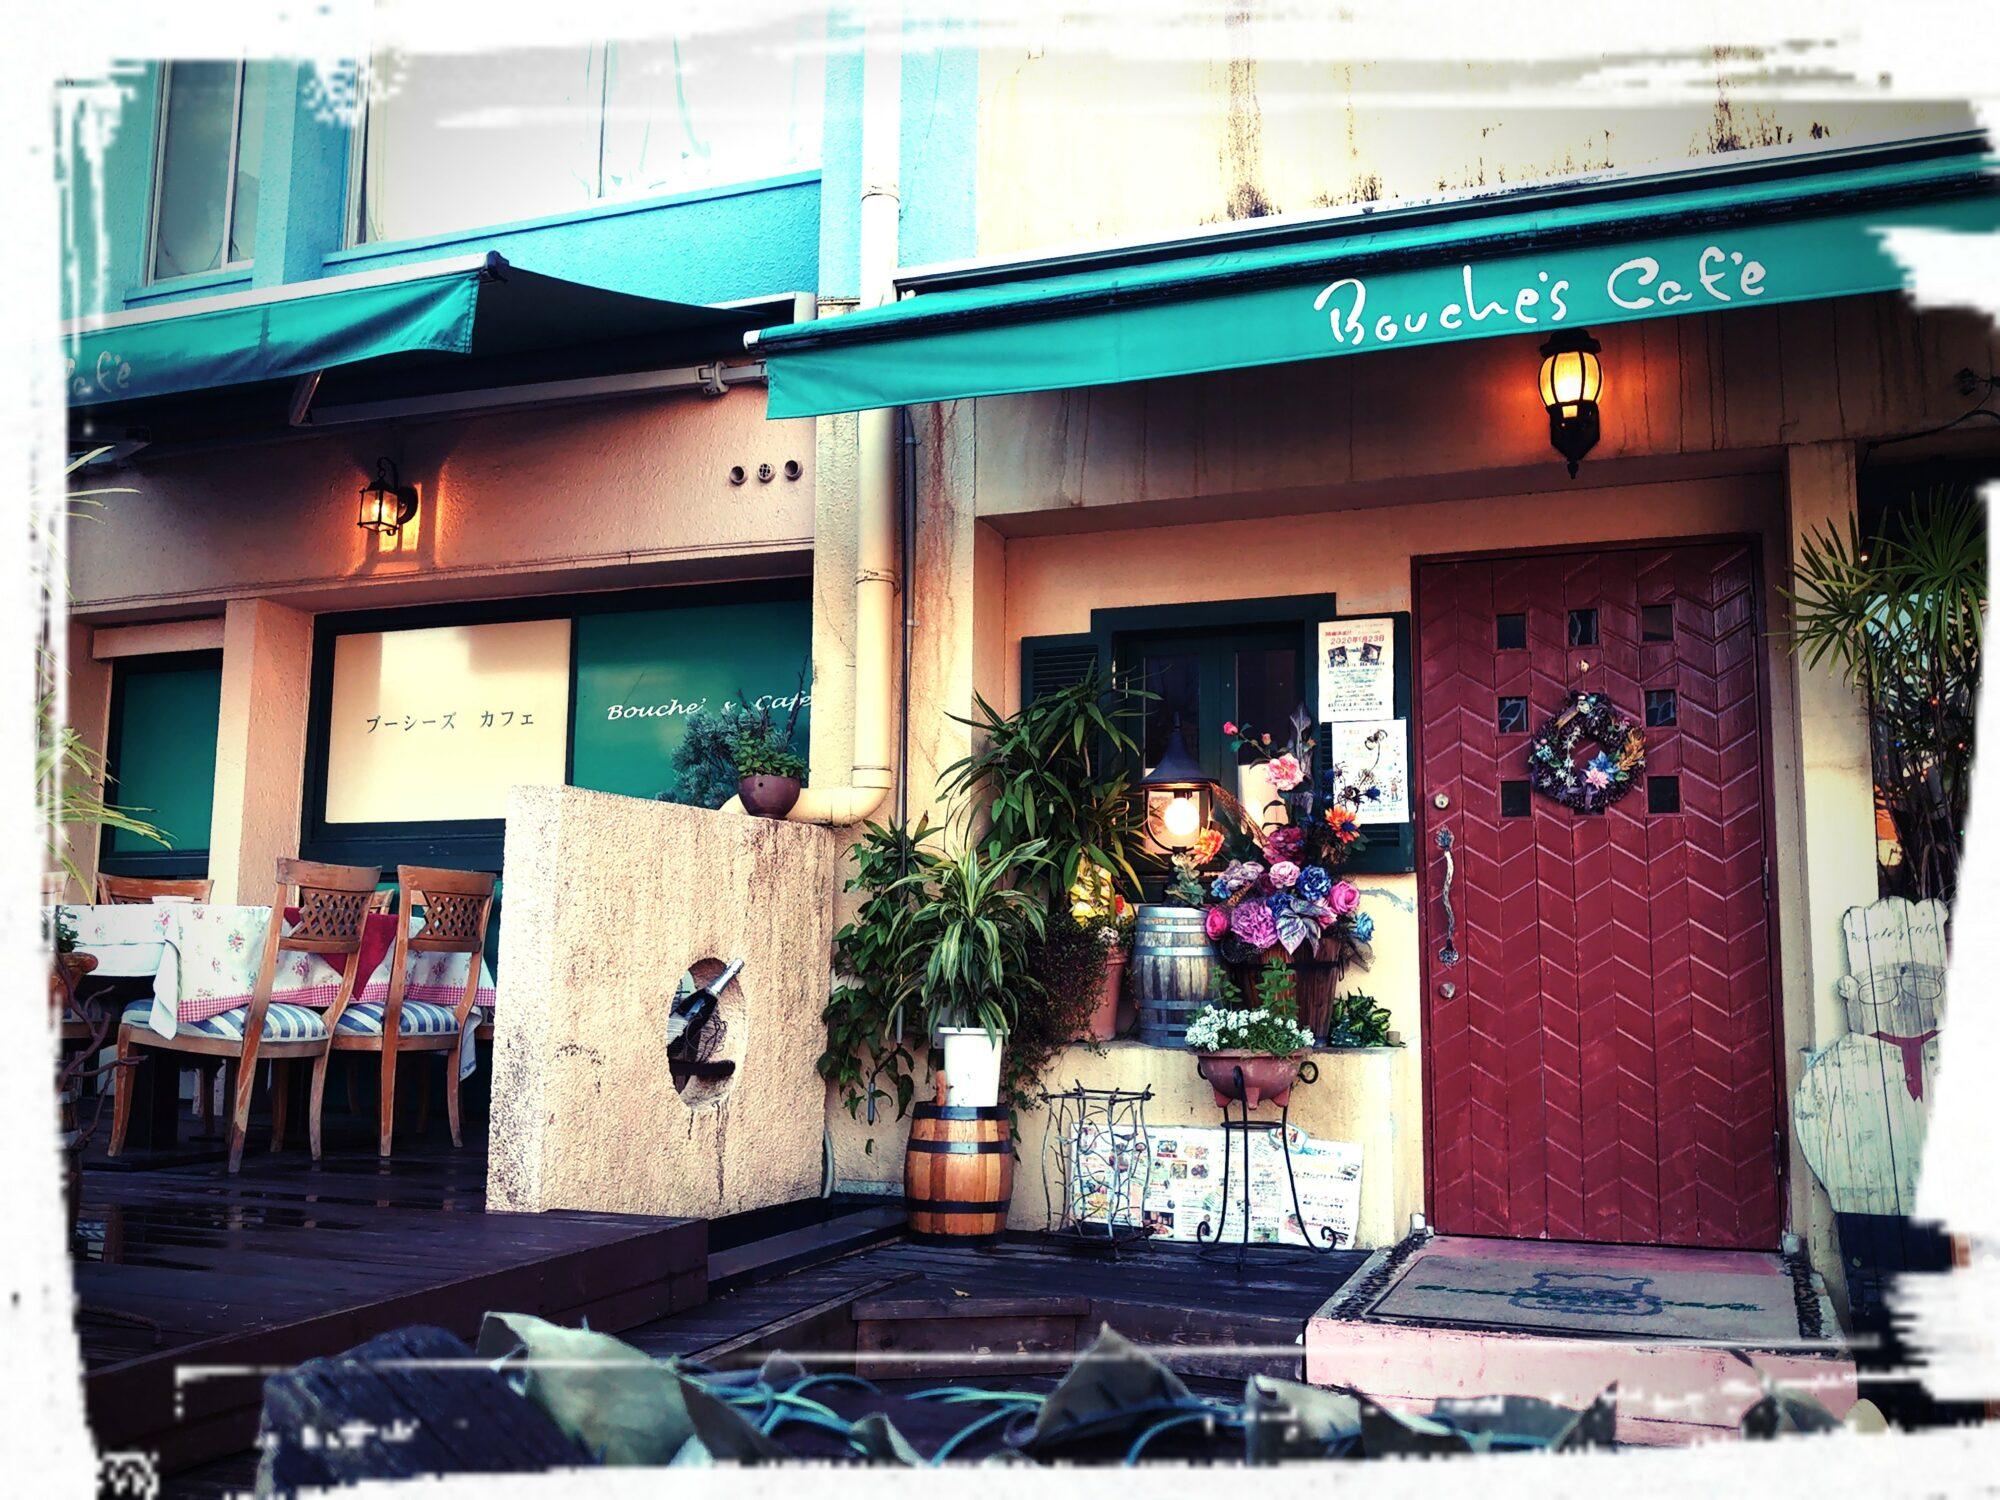 Bouches Cafe(ブーシーズカフェ)の写真